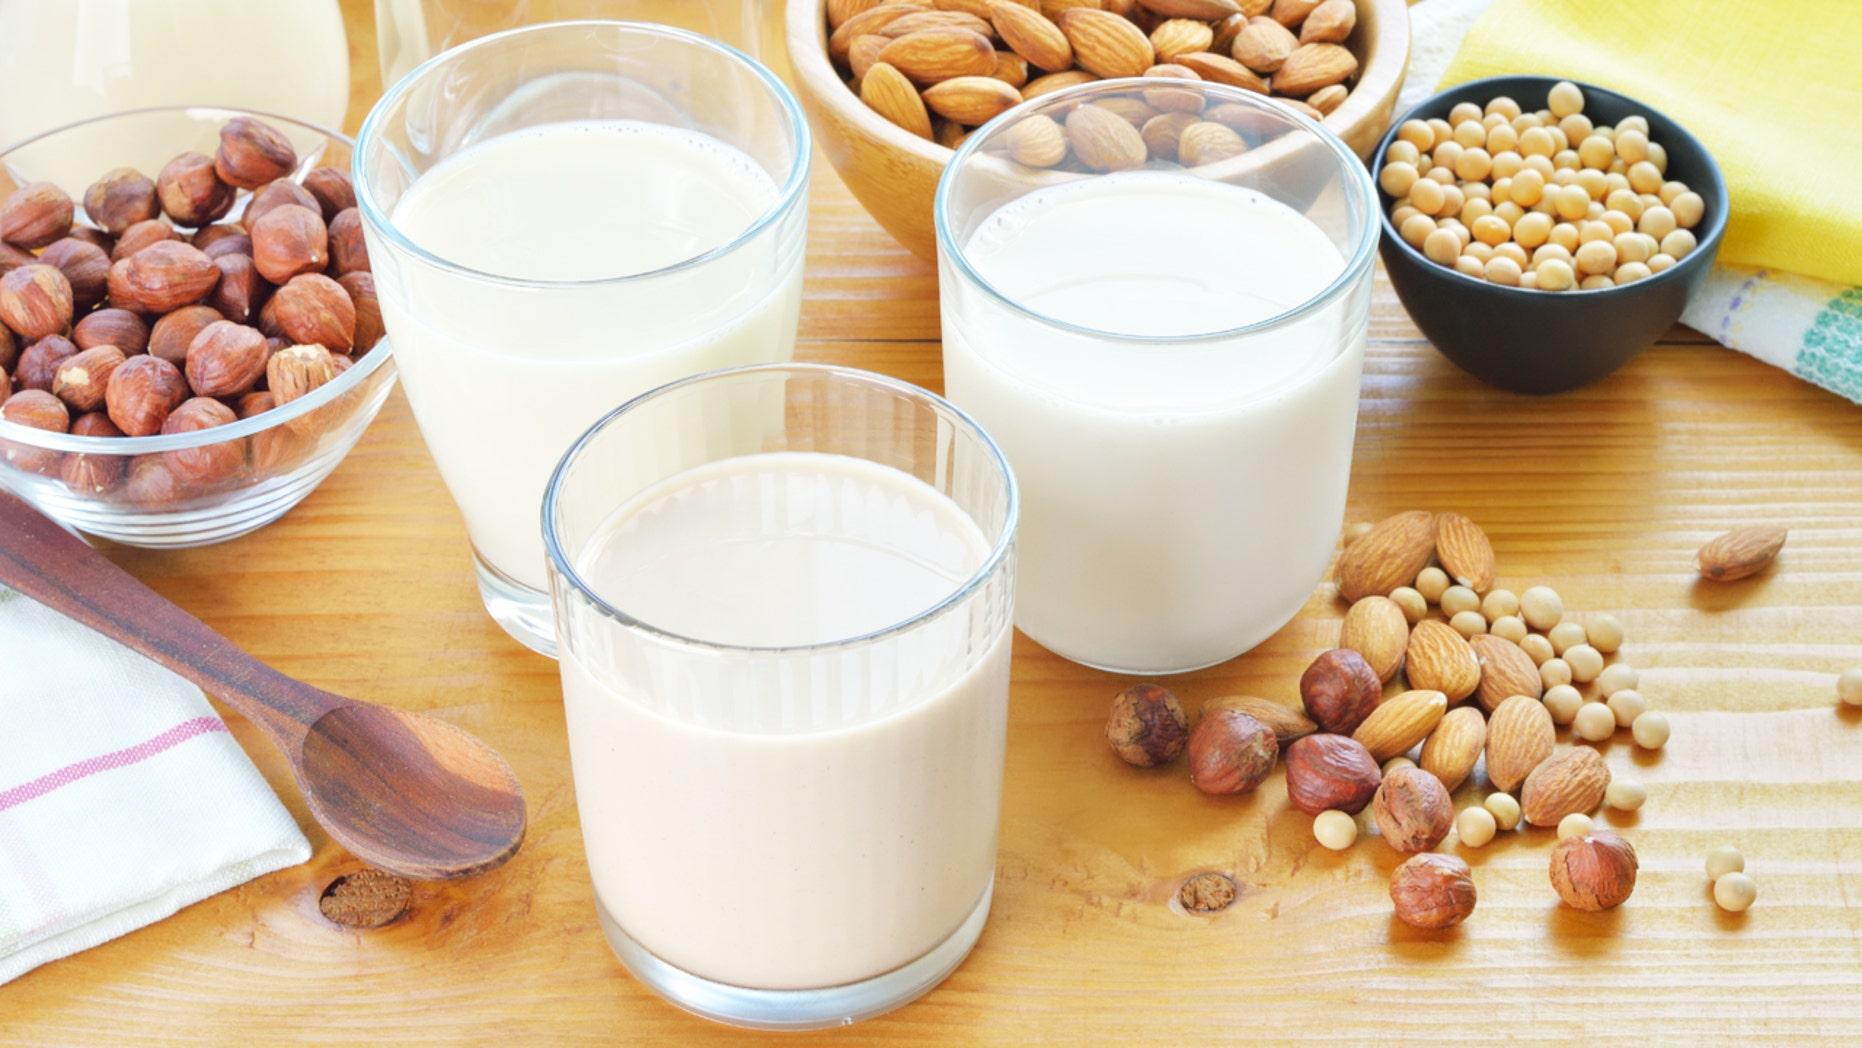 Are vegan milks hurting dairy farmers?